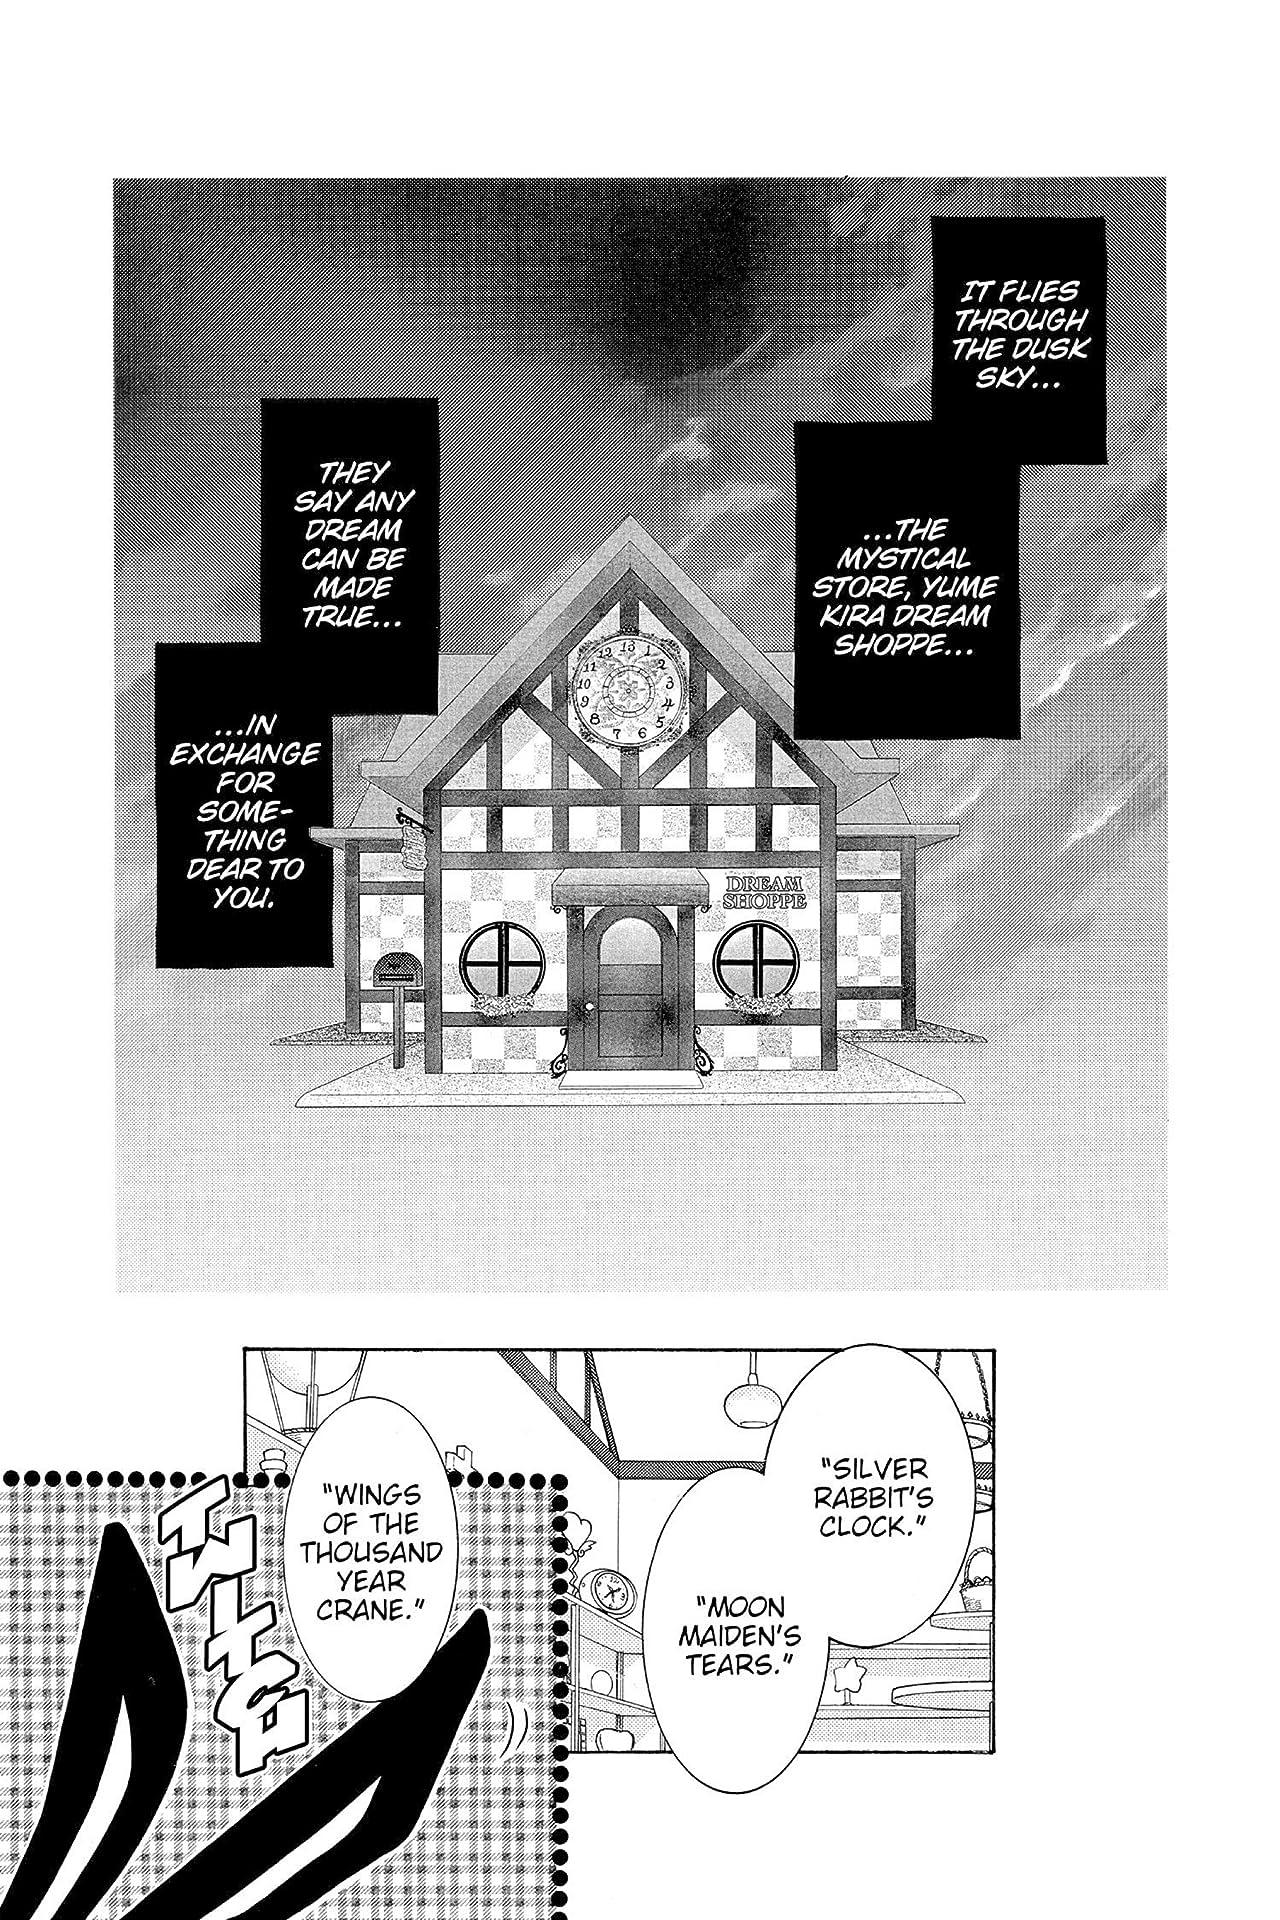 Yume Kira Dream Shoppe Vol. 1